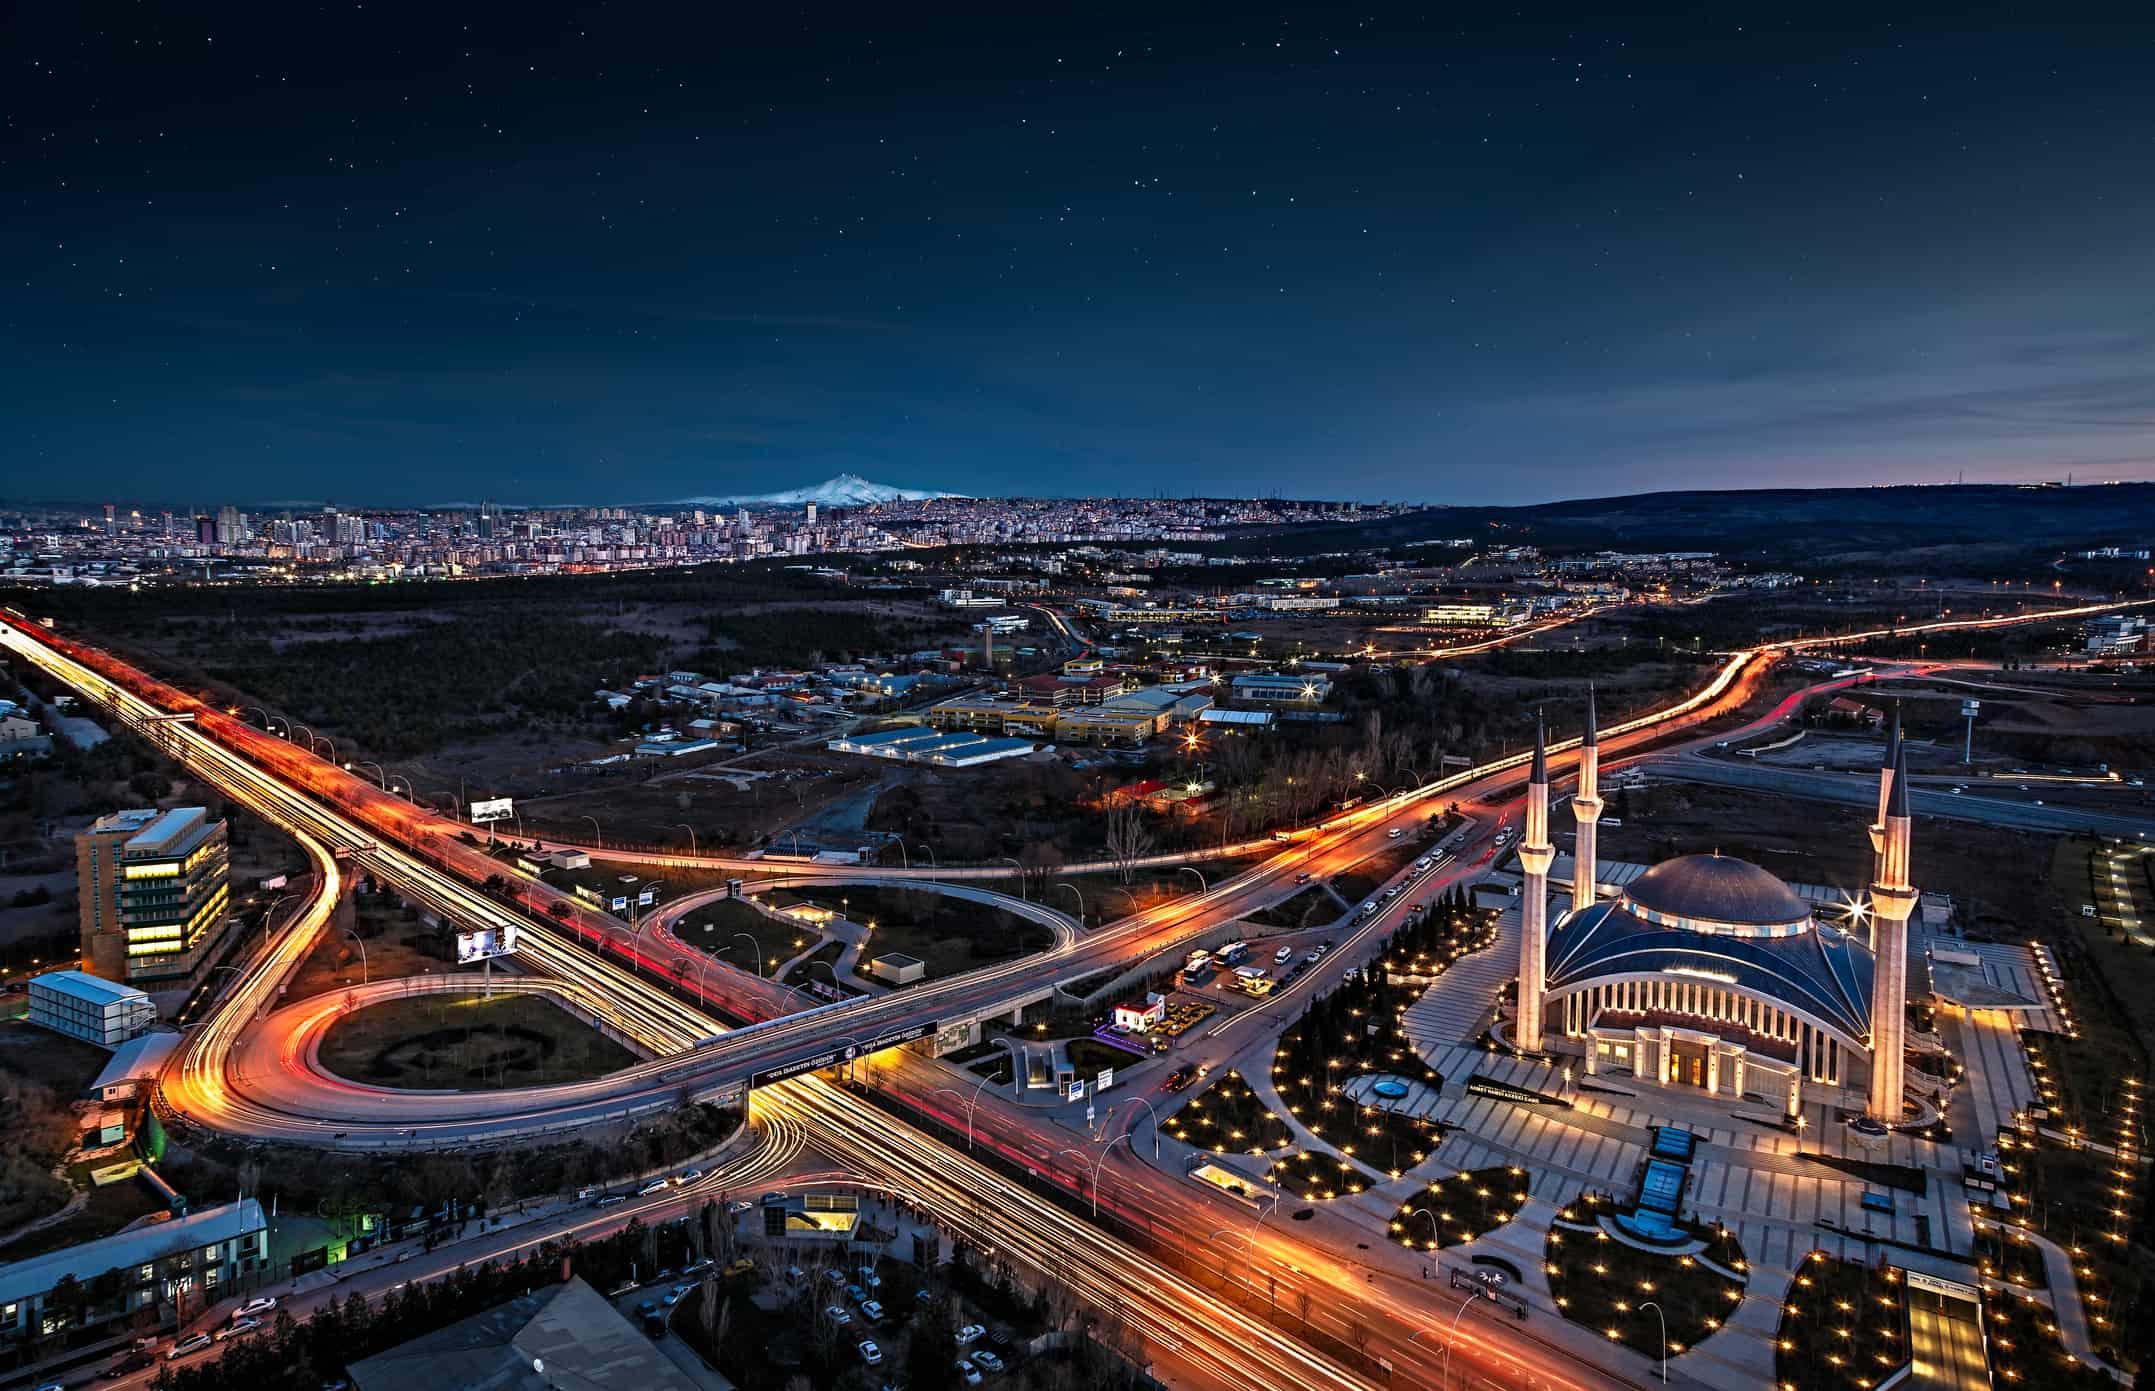 Ankara, Turkey at night